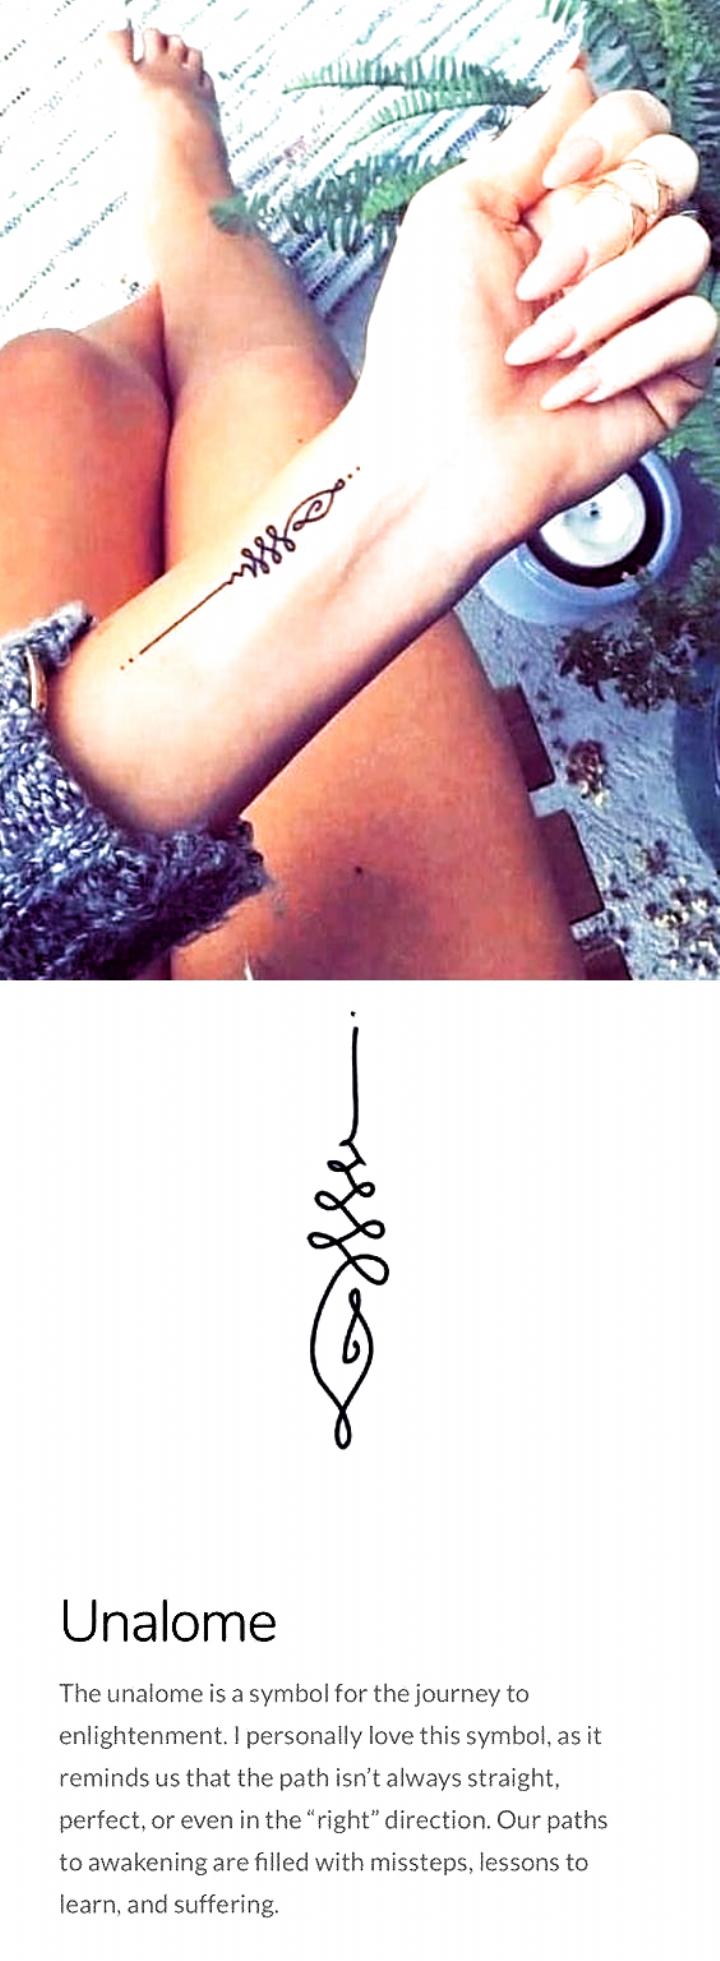 Tattoo Ideen einzigartig sinnvoll in 20   Tiny tattoos for women ...